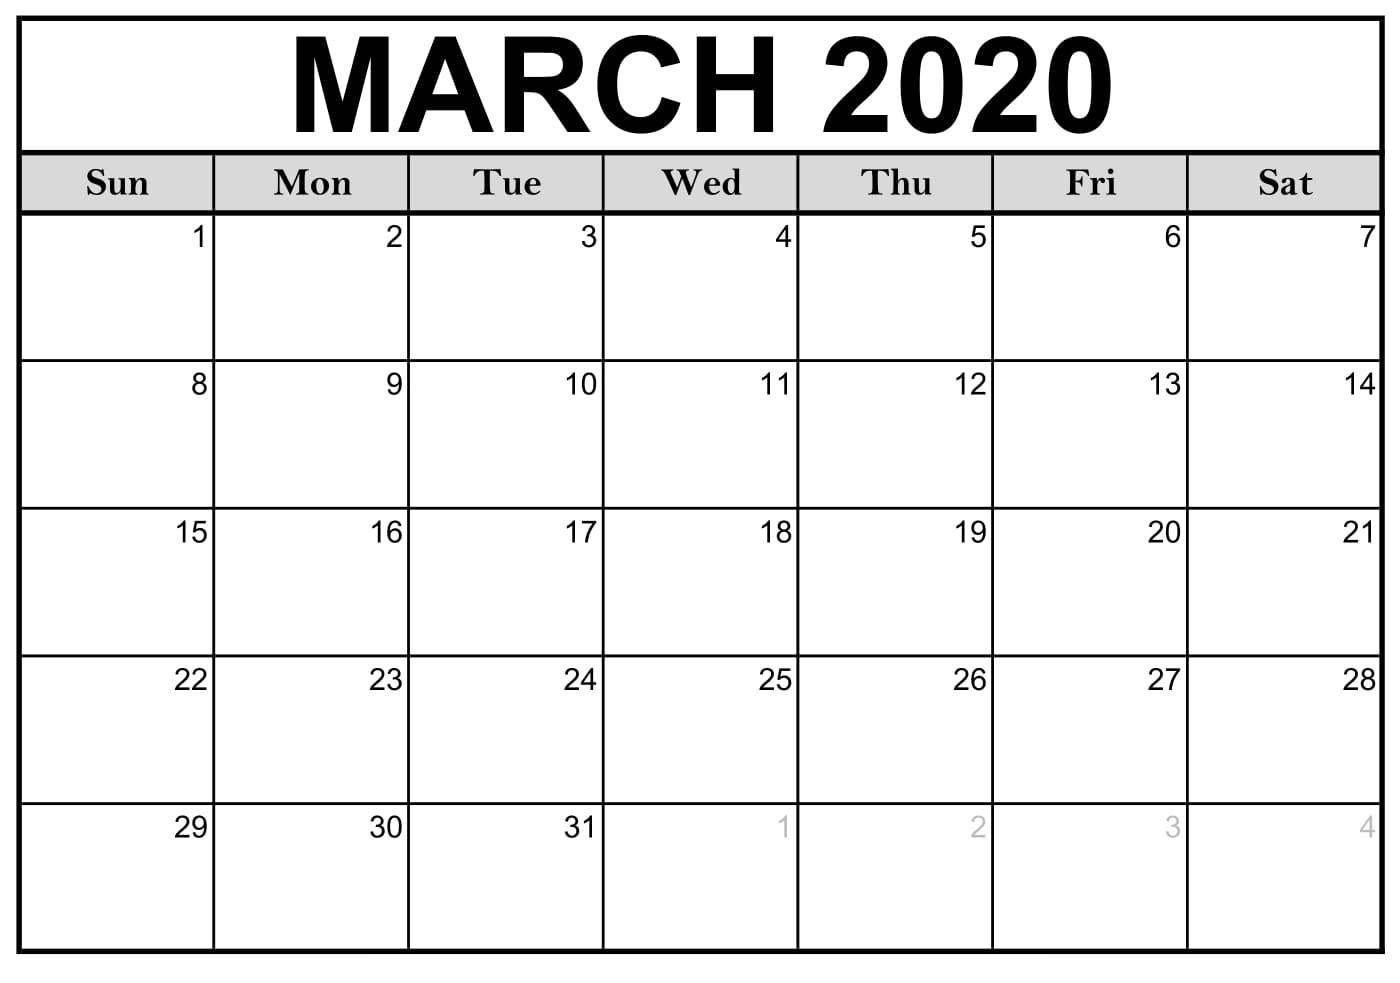 Printable Fill In 2020 Calndar - Calendar Inspiration Design Calendar To Fill In And Print